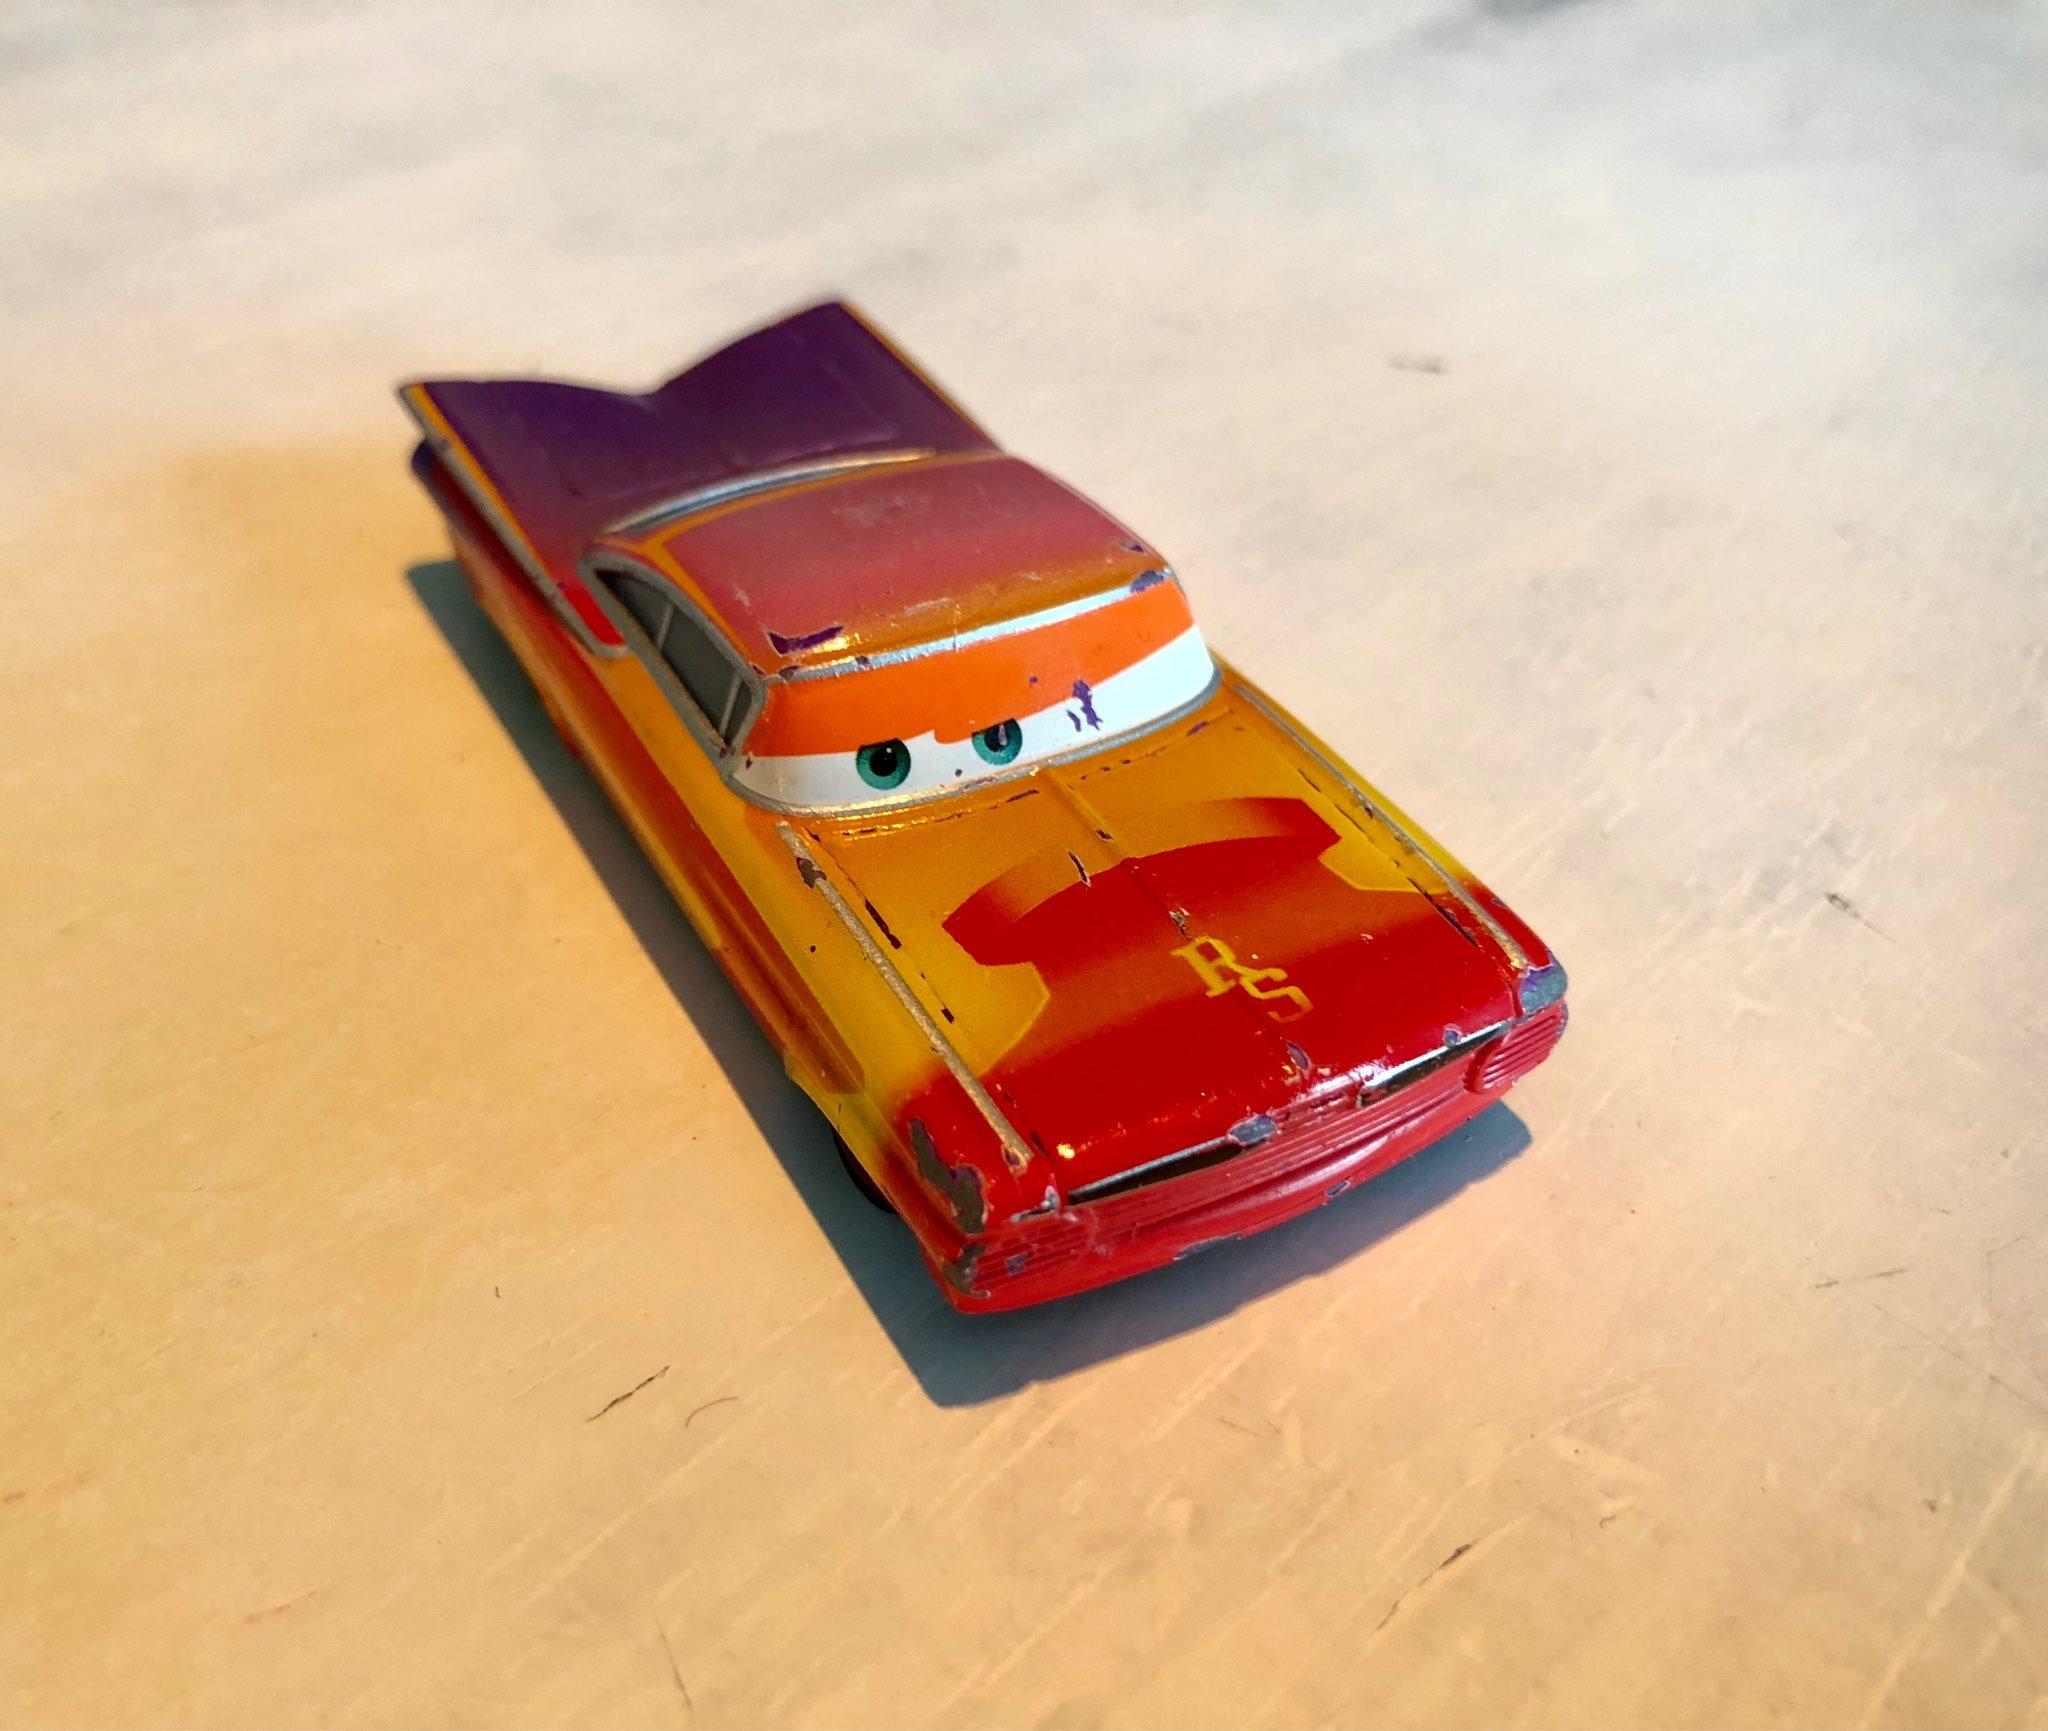 Disney Bilar 2 Radiator Springs Ramone - Metall.. (338169512) ᐈ Köp ... 361b15136924d